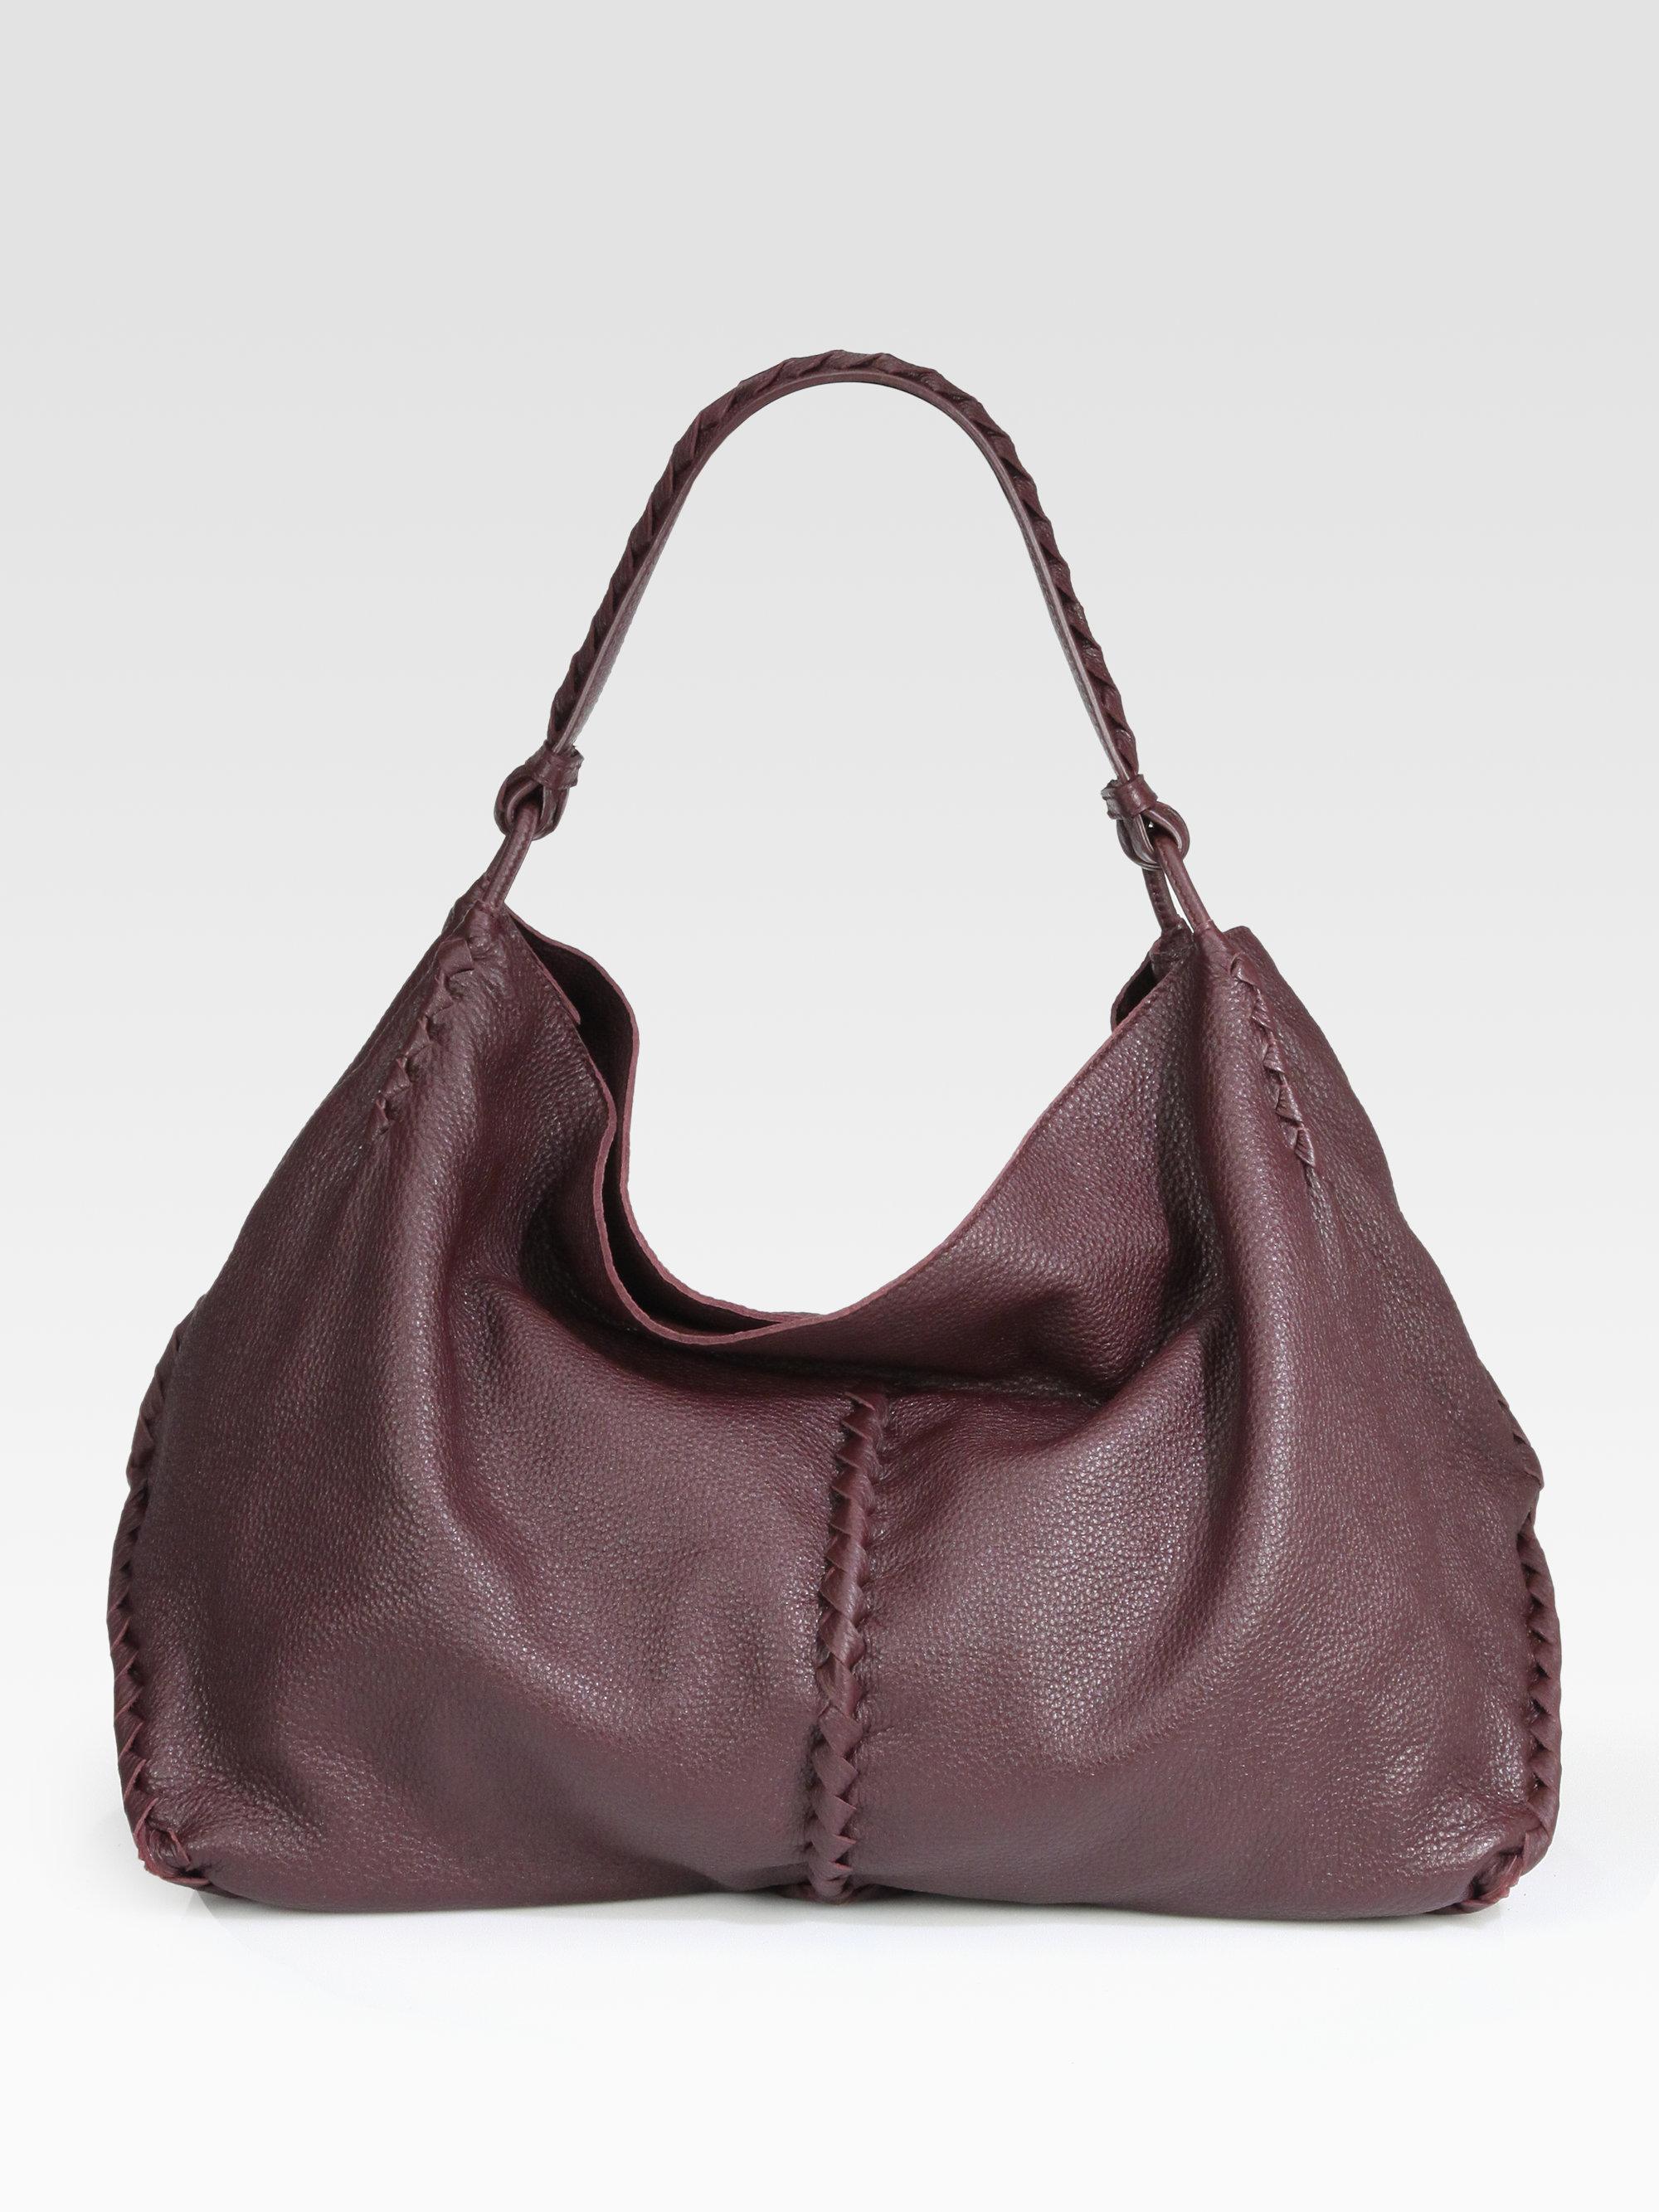 9bb0148de27 Lyst - Bottega Veneta Cervo Large Hobo Bag in Brown